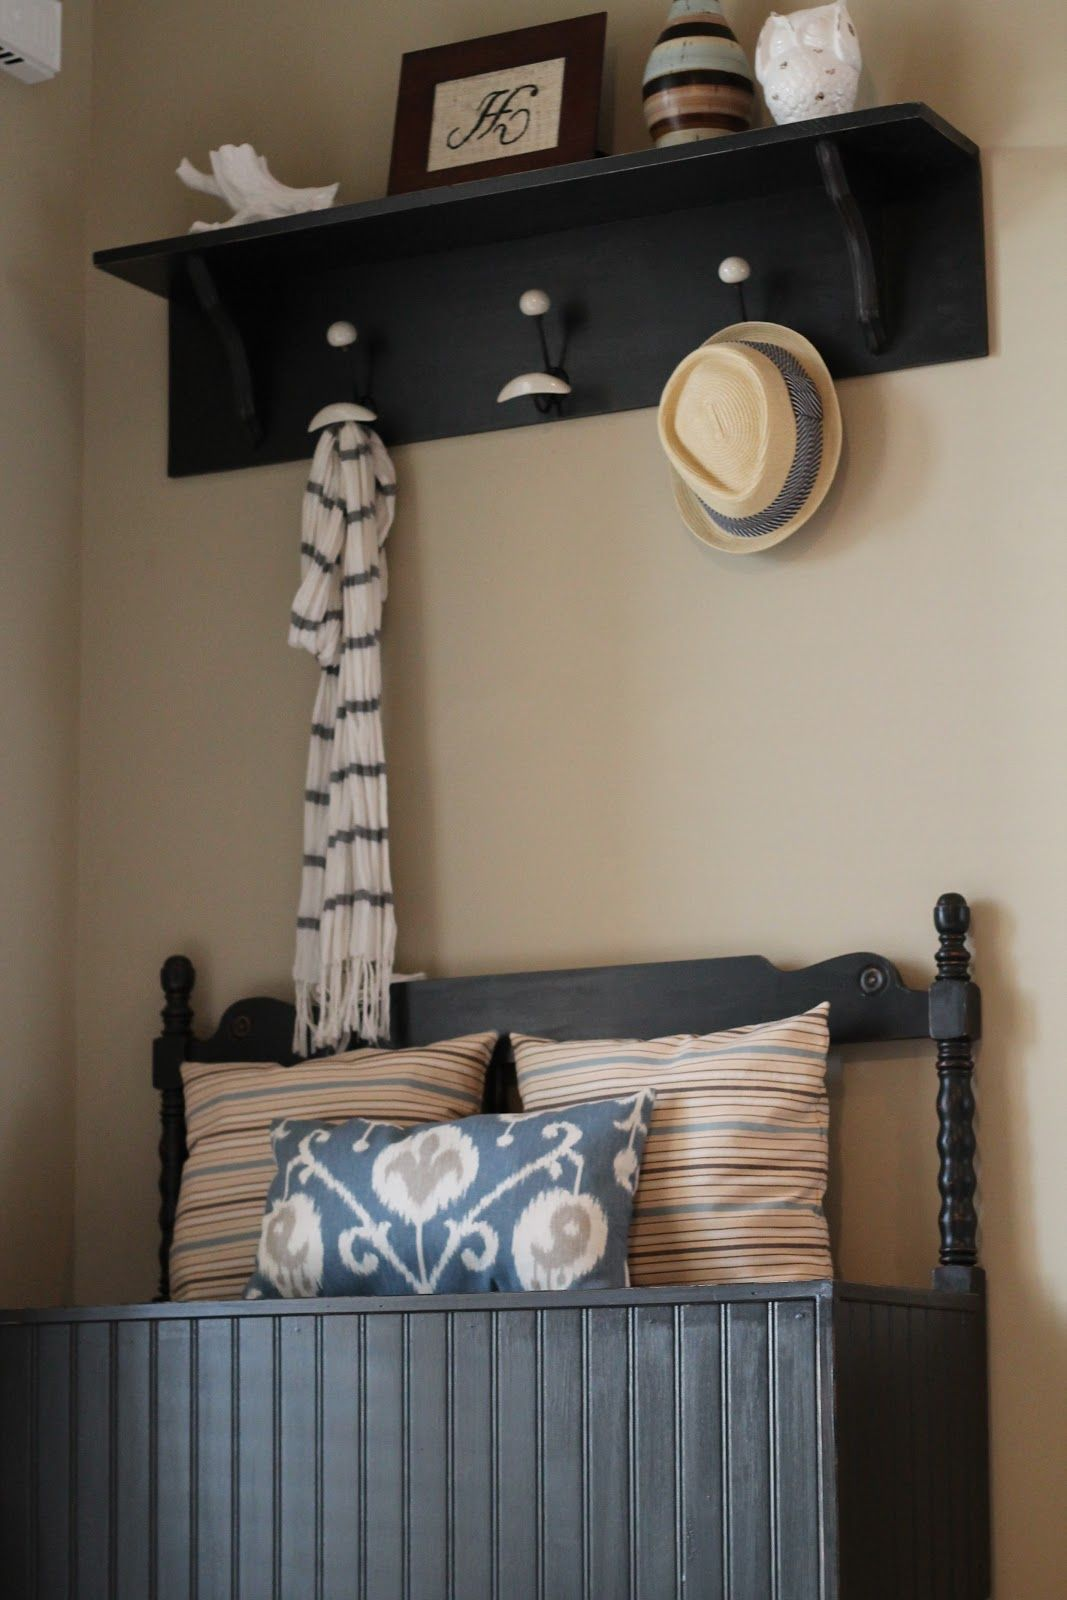 Discount Woodworking Tools Diy coat rack, Home decor